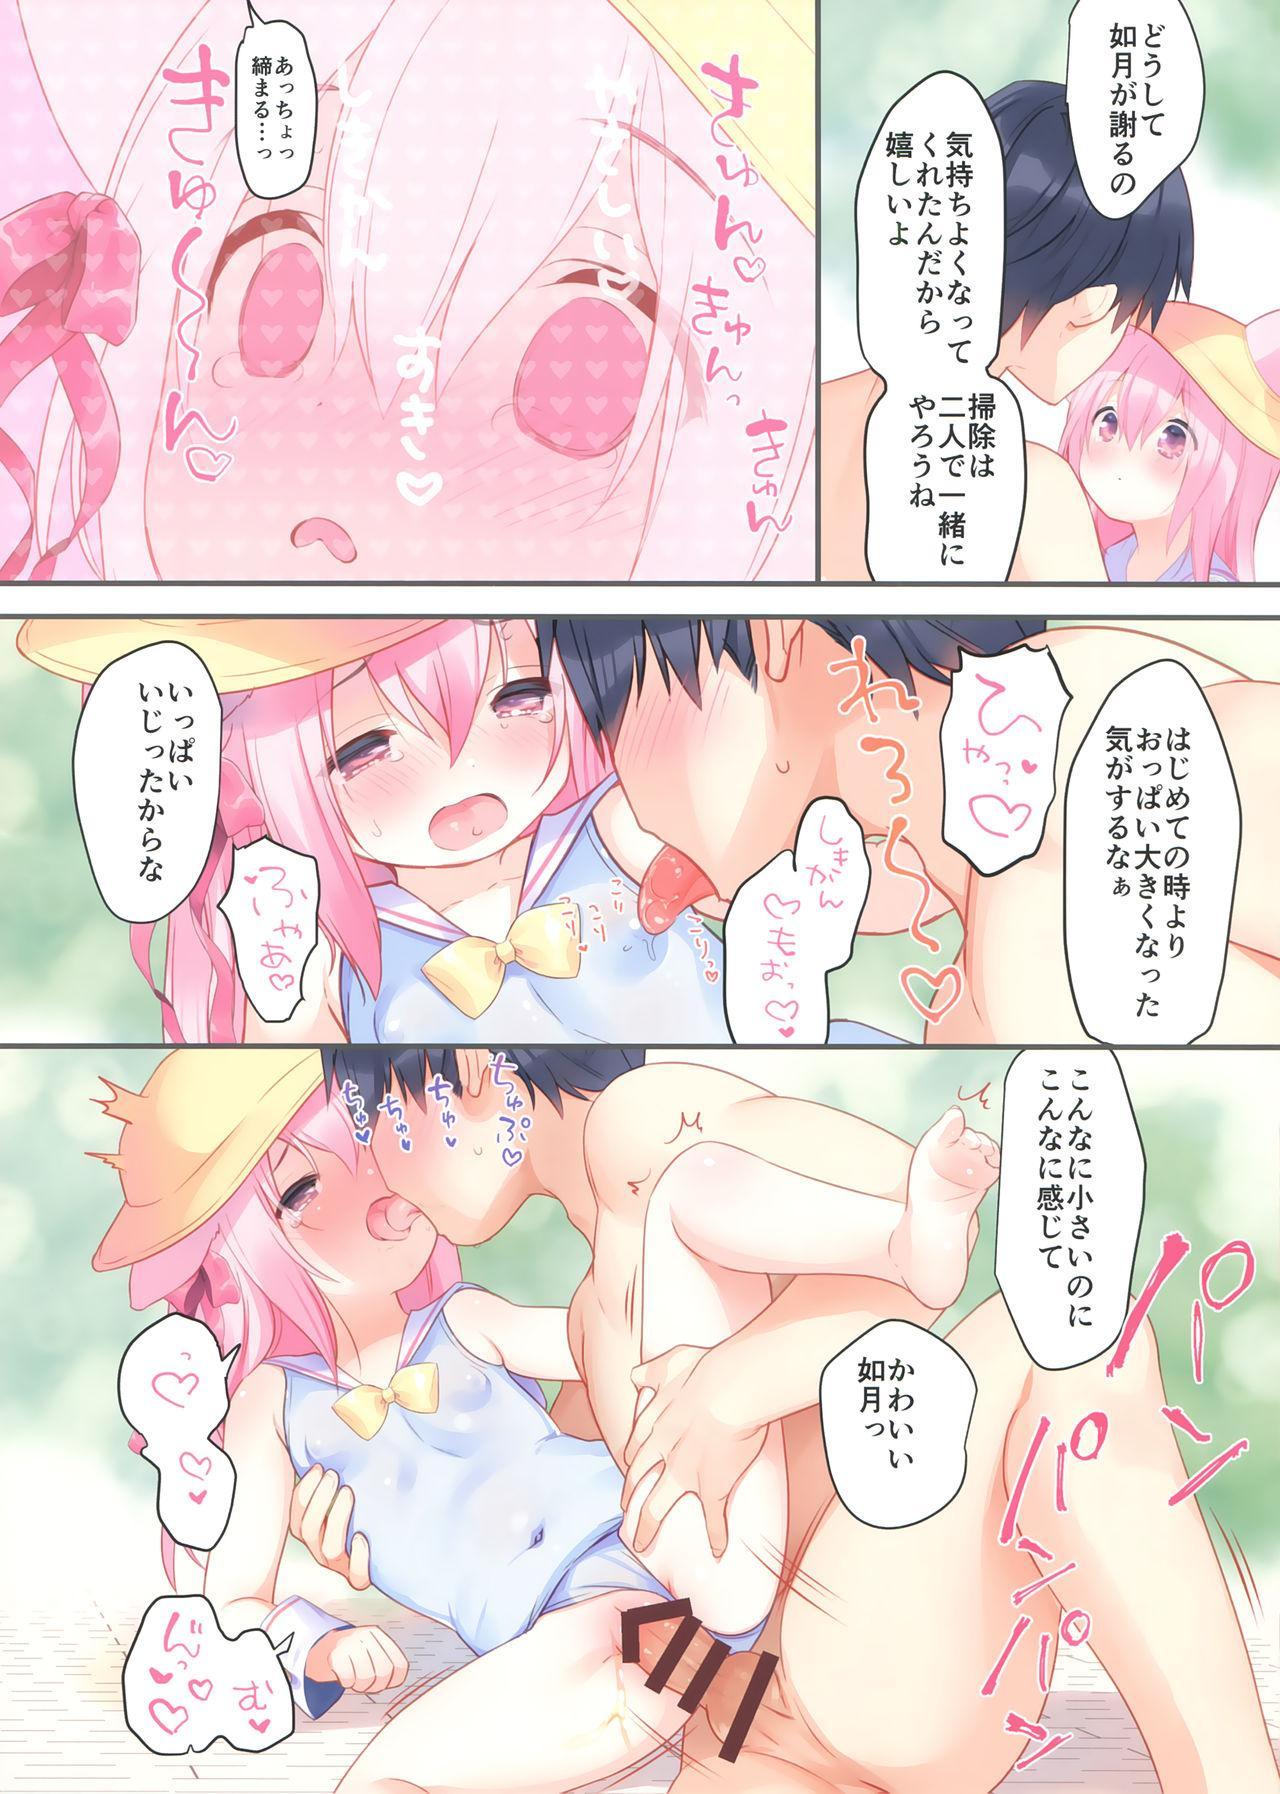 (Mimiket 40) [PiyoPit (Piyodera Mucha)] Kisaragi-chan wa Kawaisou ja Nai! - Kisaragi-chan is not pitiful! (Azur Lane) 10